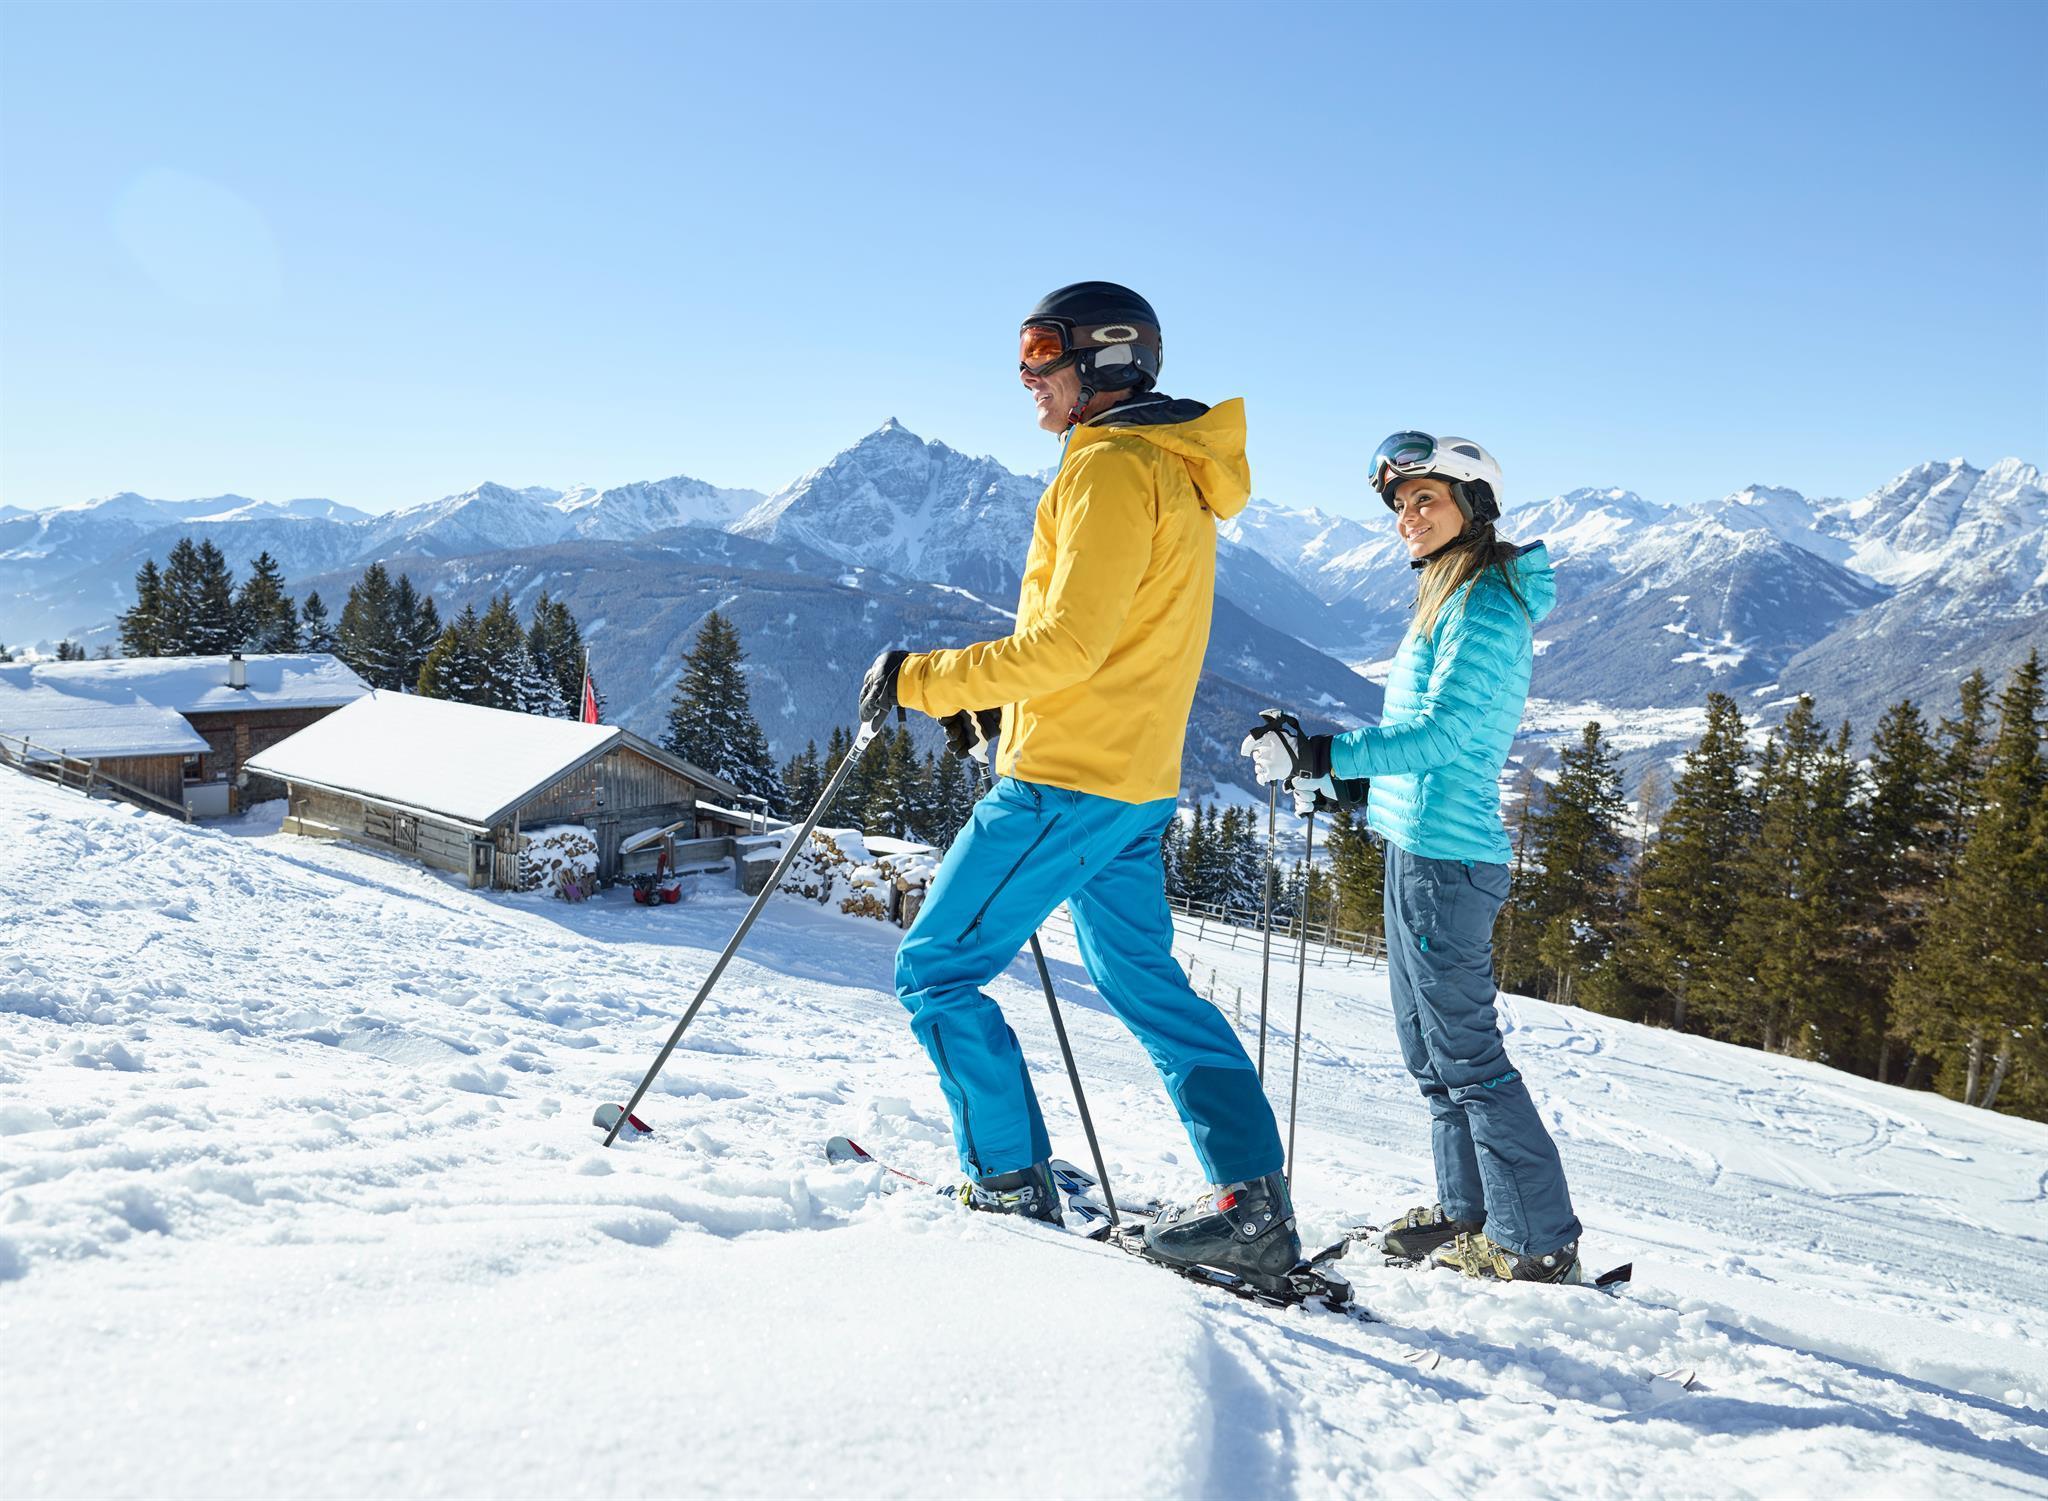 snowsport IGLS-PATSCHERKOFEL - Wolfgang Platzer